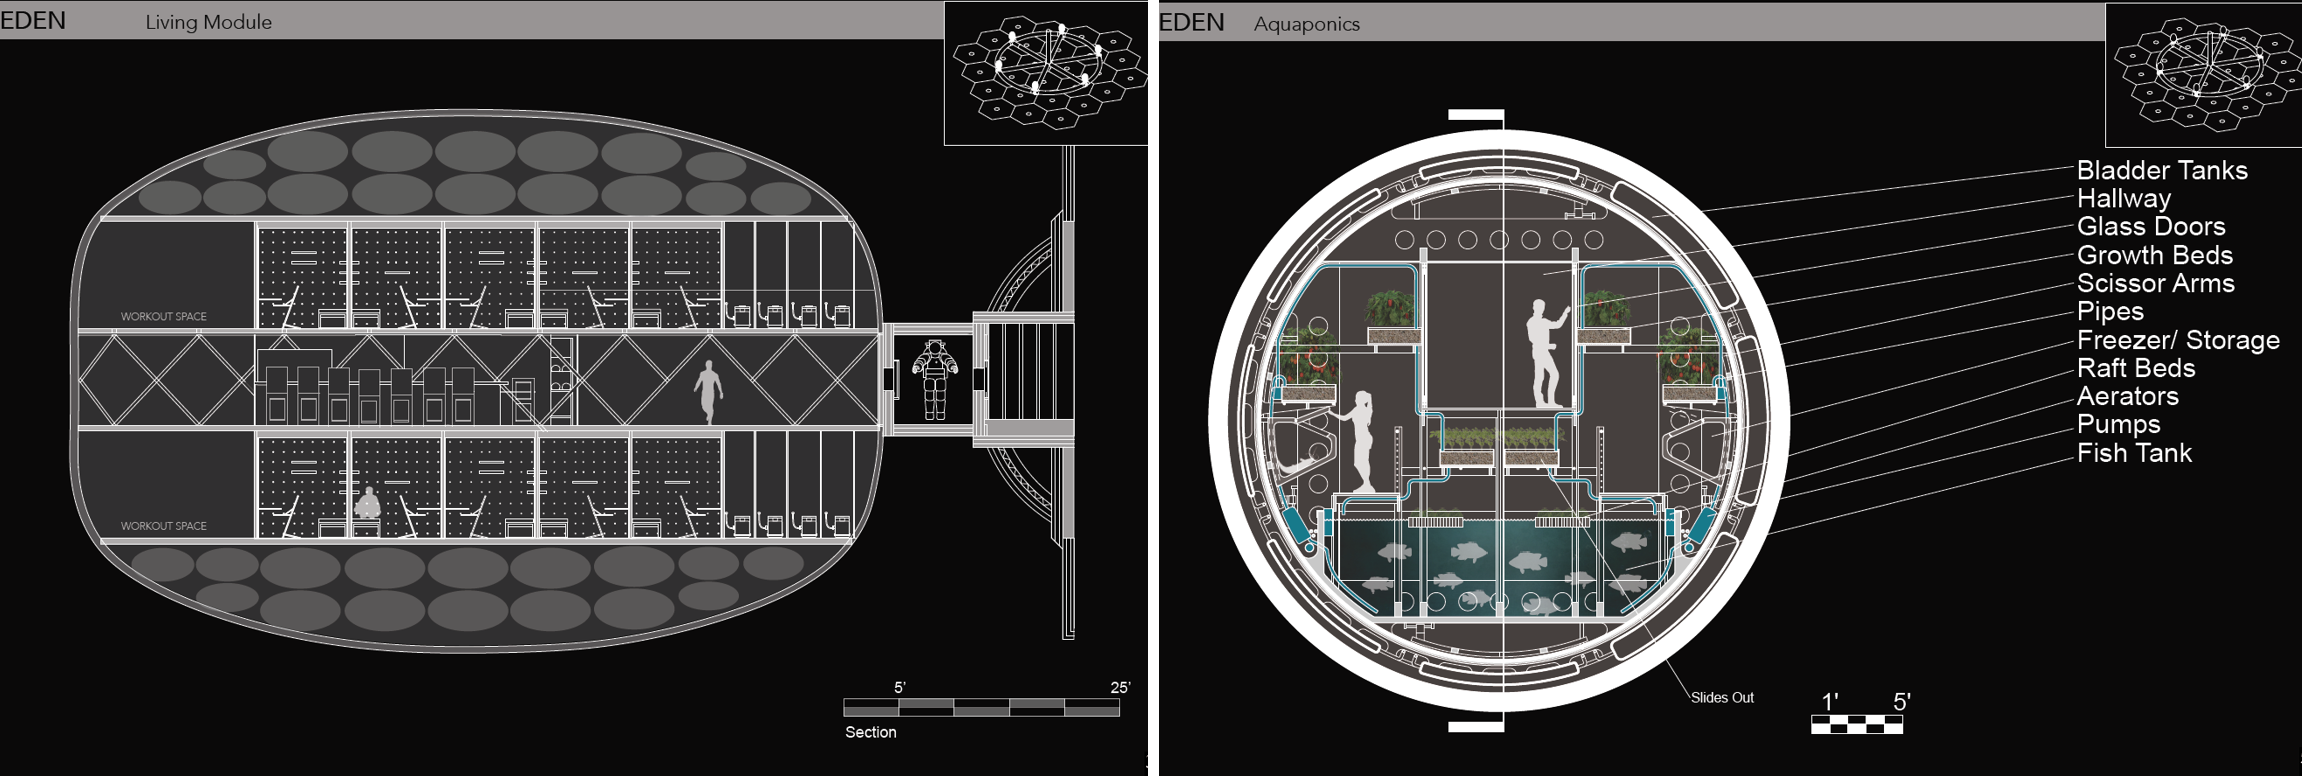 Students Design Space Habitat Concepts for Mars   NASA